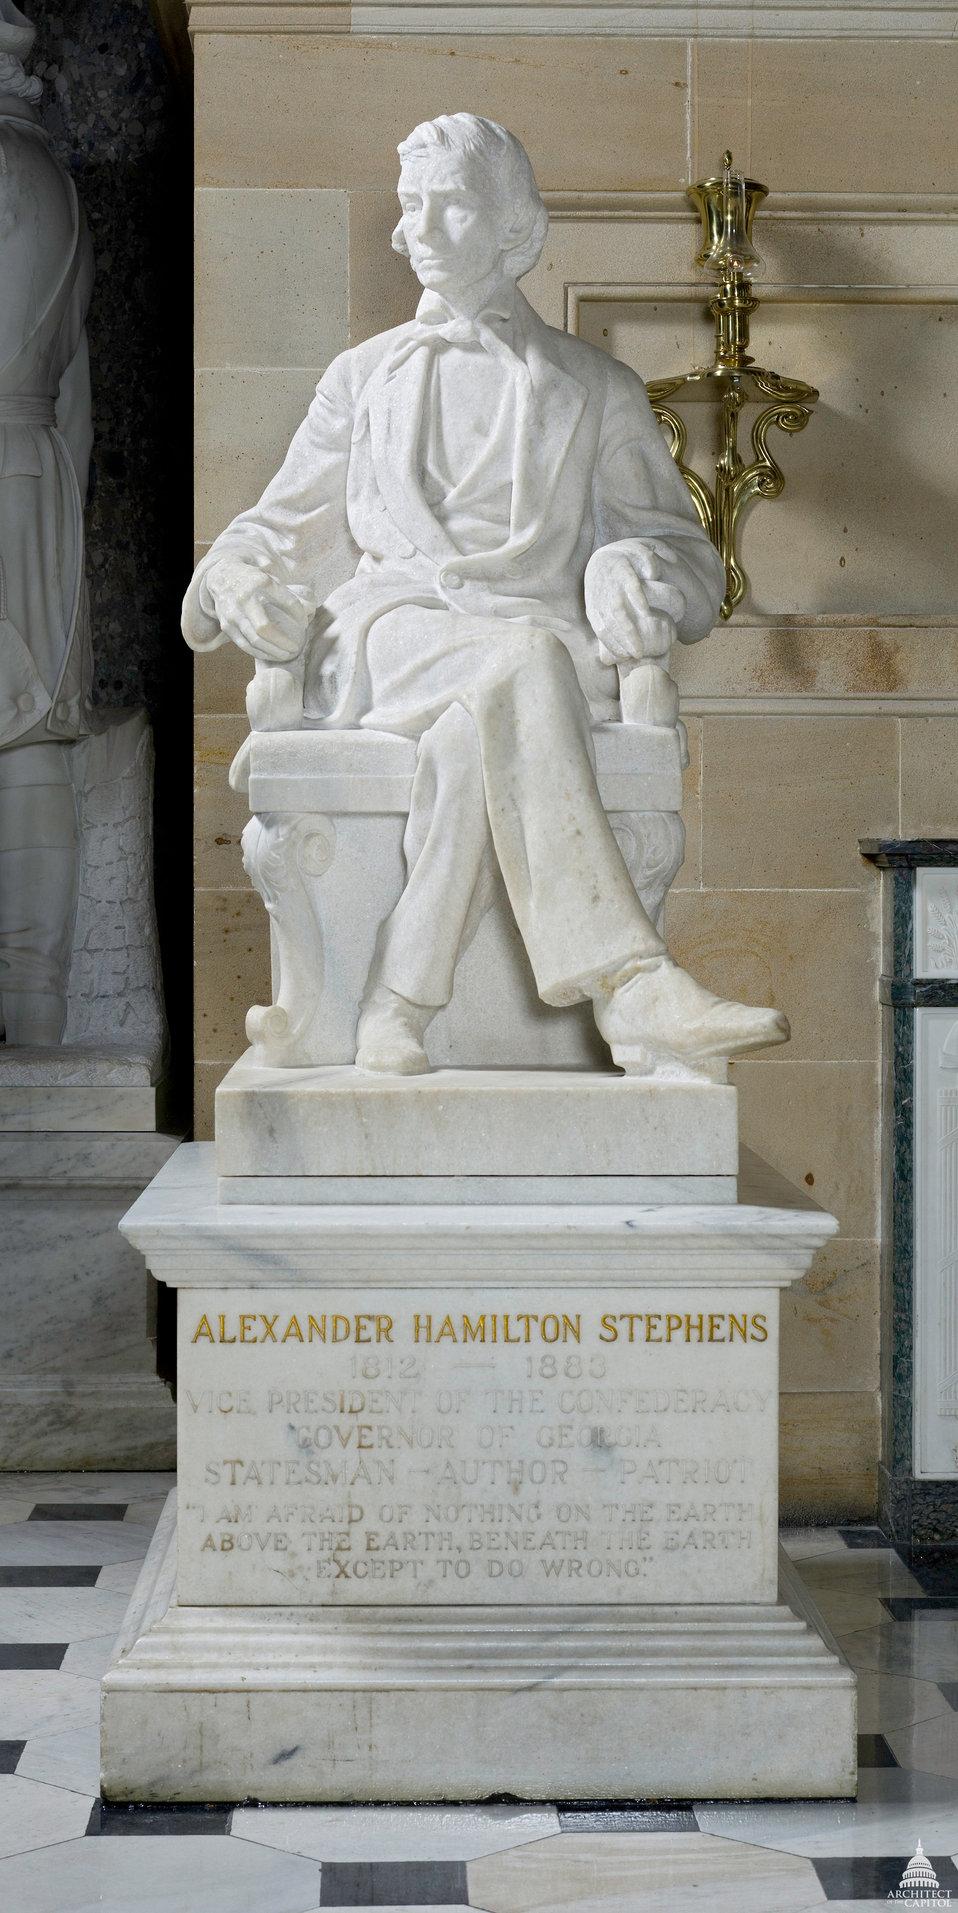 Alexander Hamilton Stephens Statue